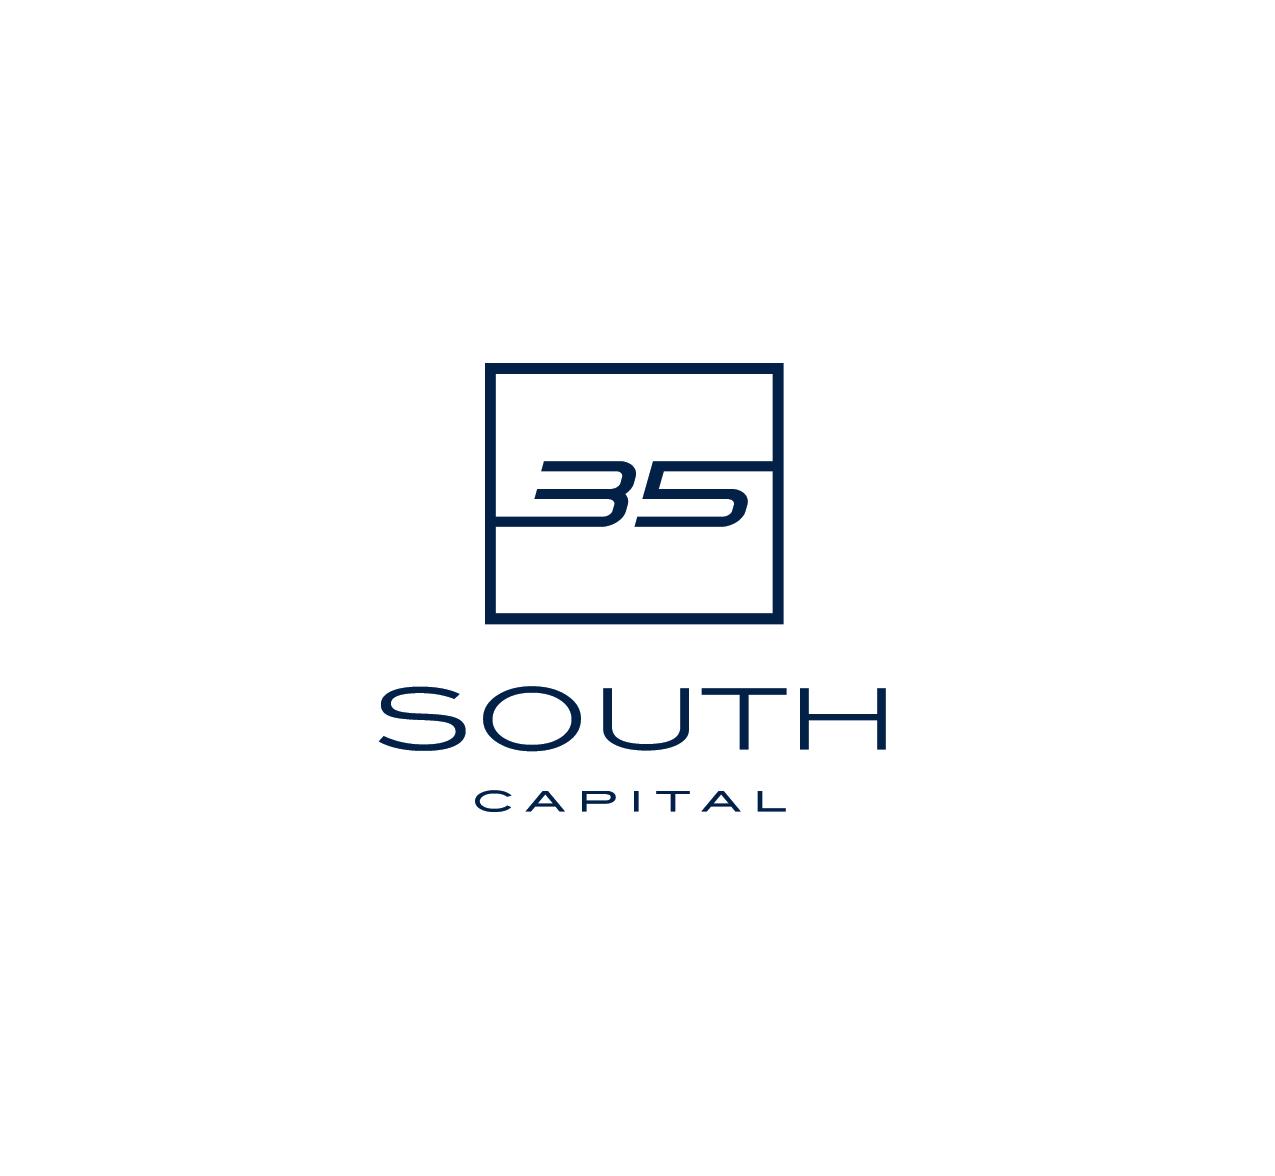 35 South Capital Advisors